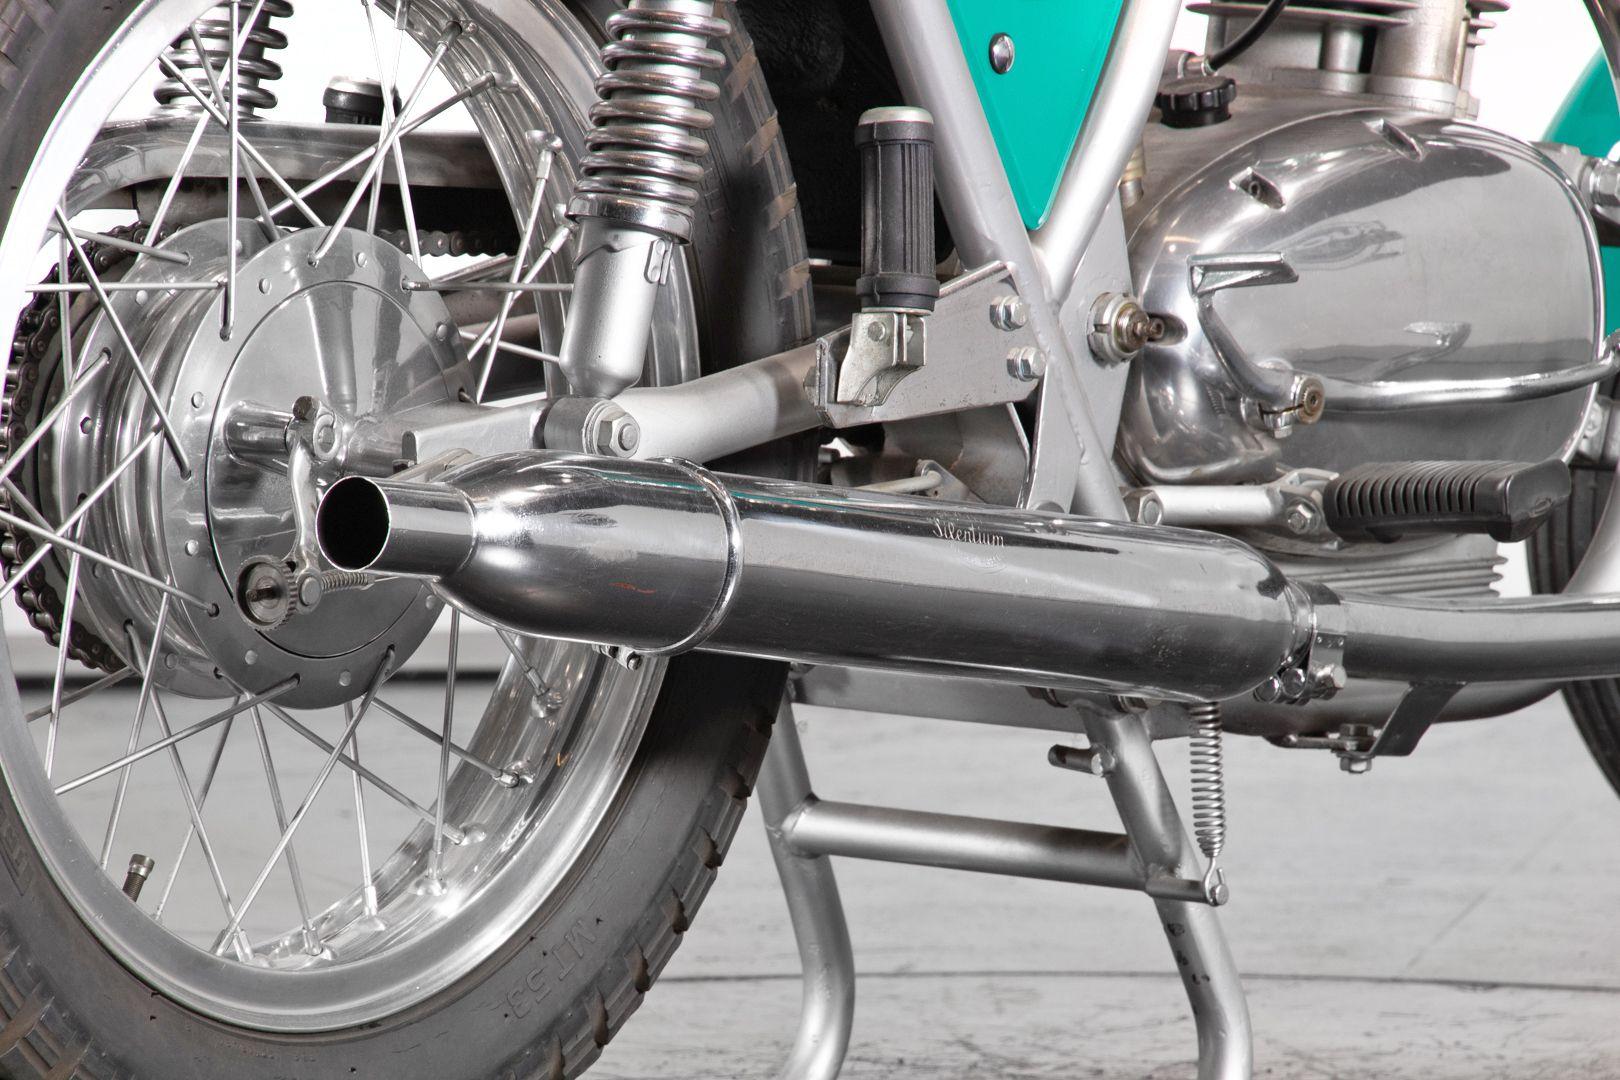 1968 Benelli 175 Reverside 74394